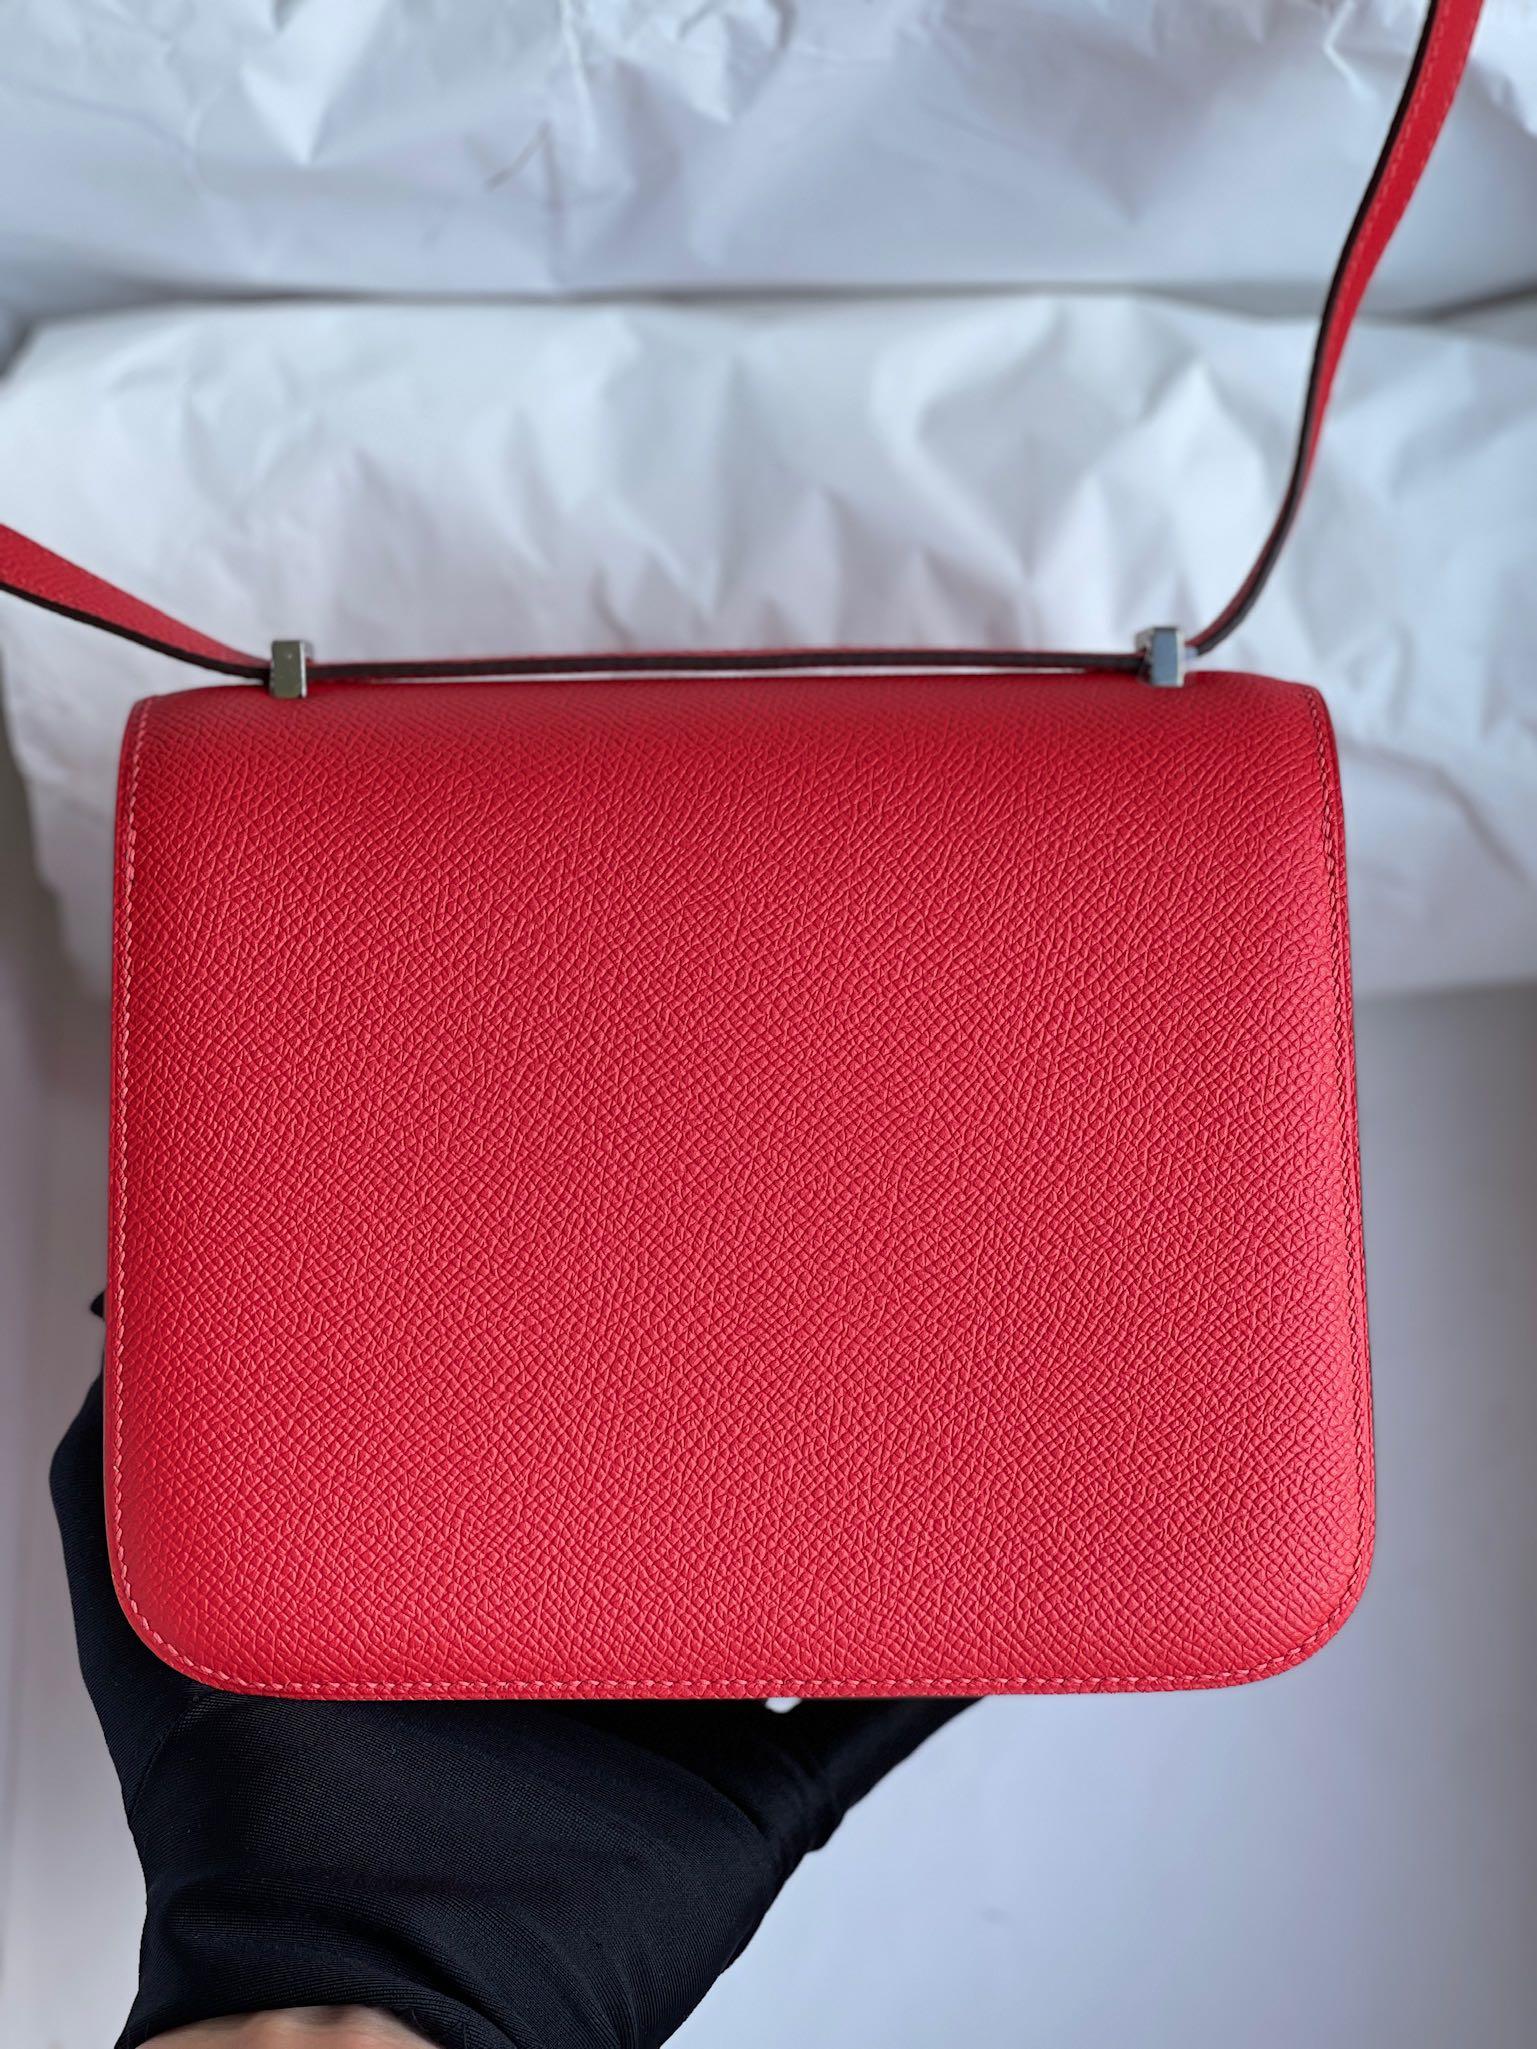 Hermès(爱马仕)Constance 康斯坦斯 Epsom 原厂掌纹皮 心红色 拼 珐琅扣 18cm 顶级手缝 定制